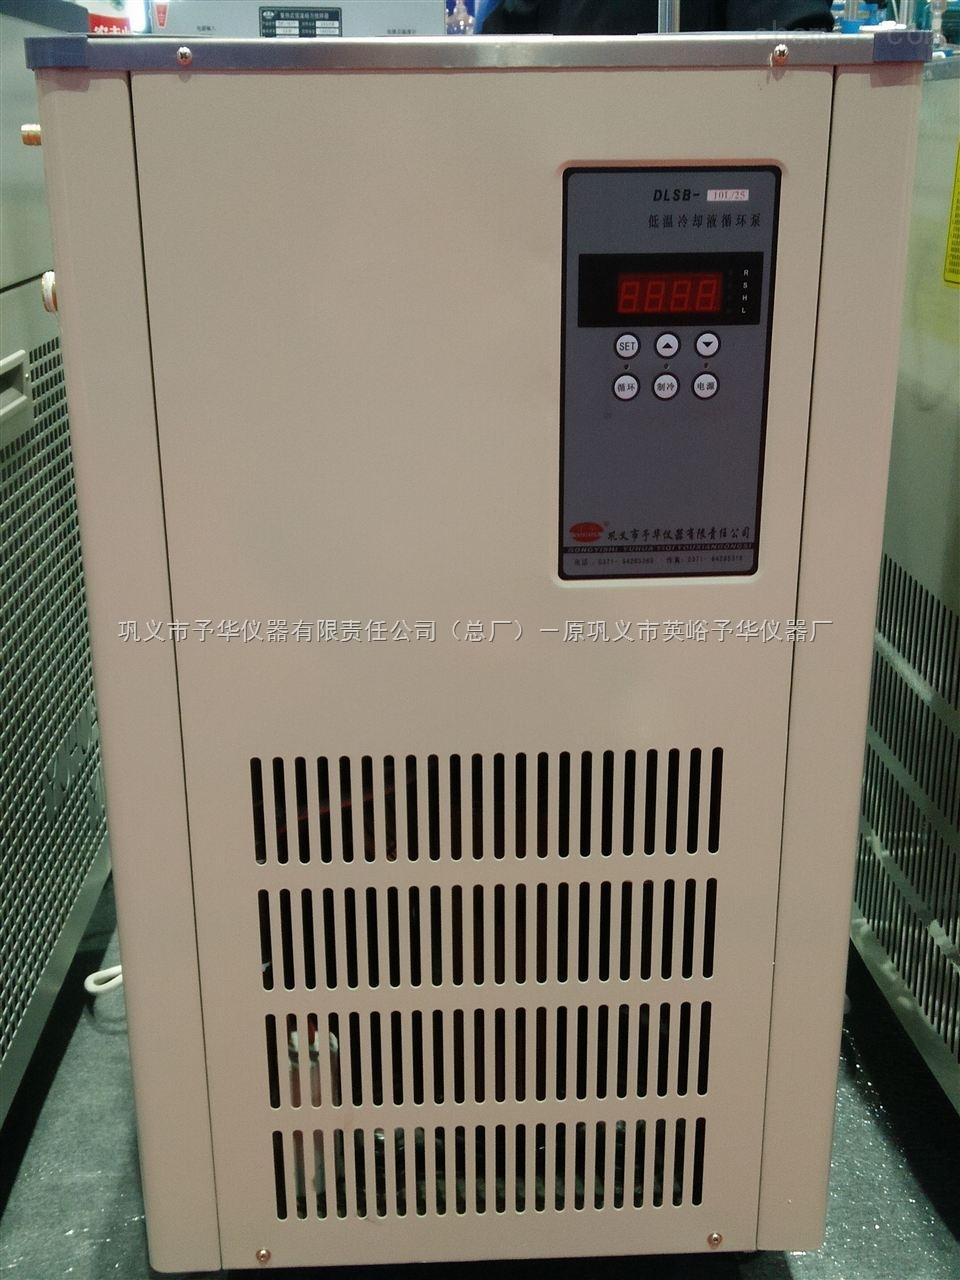 DLSB系列低温冷却液循环泵总参数、工作原理